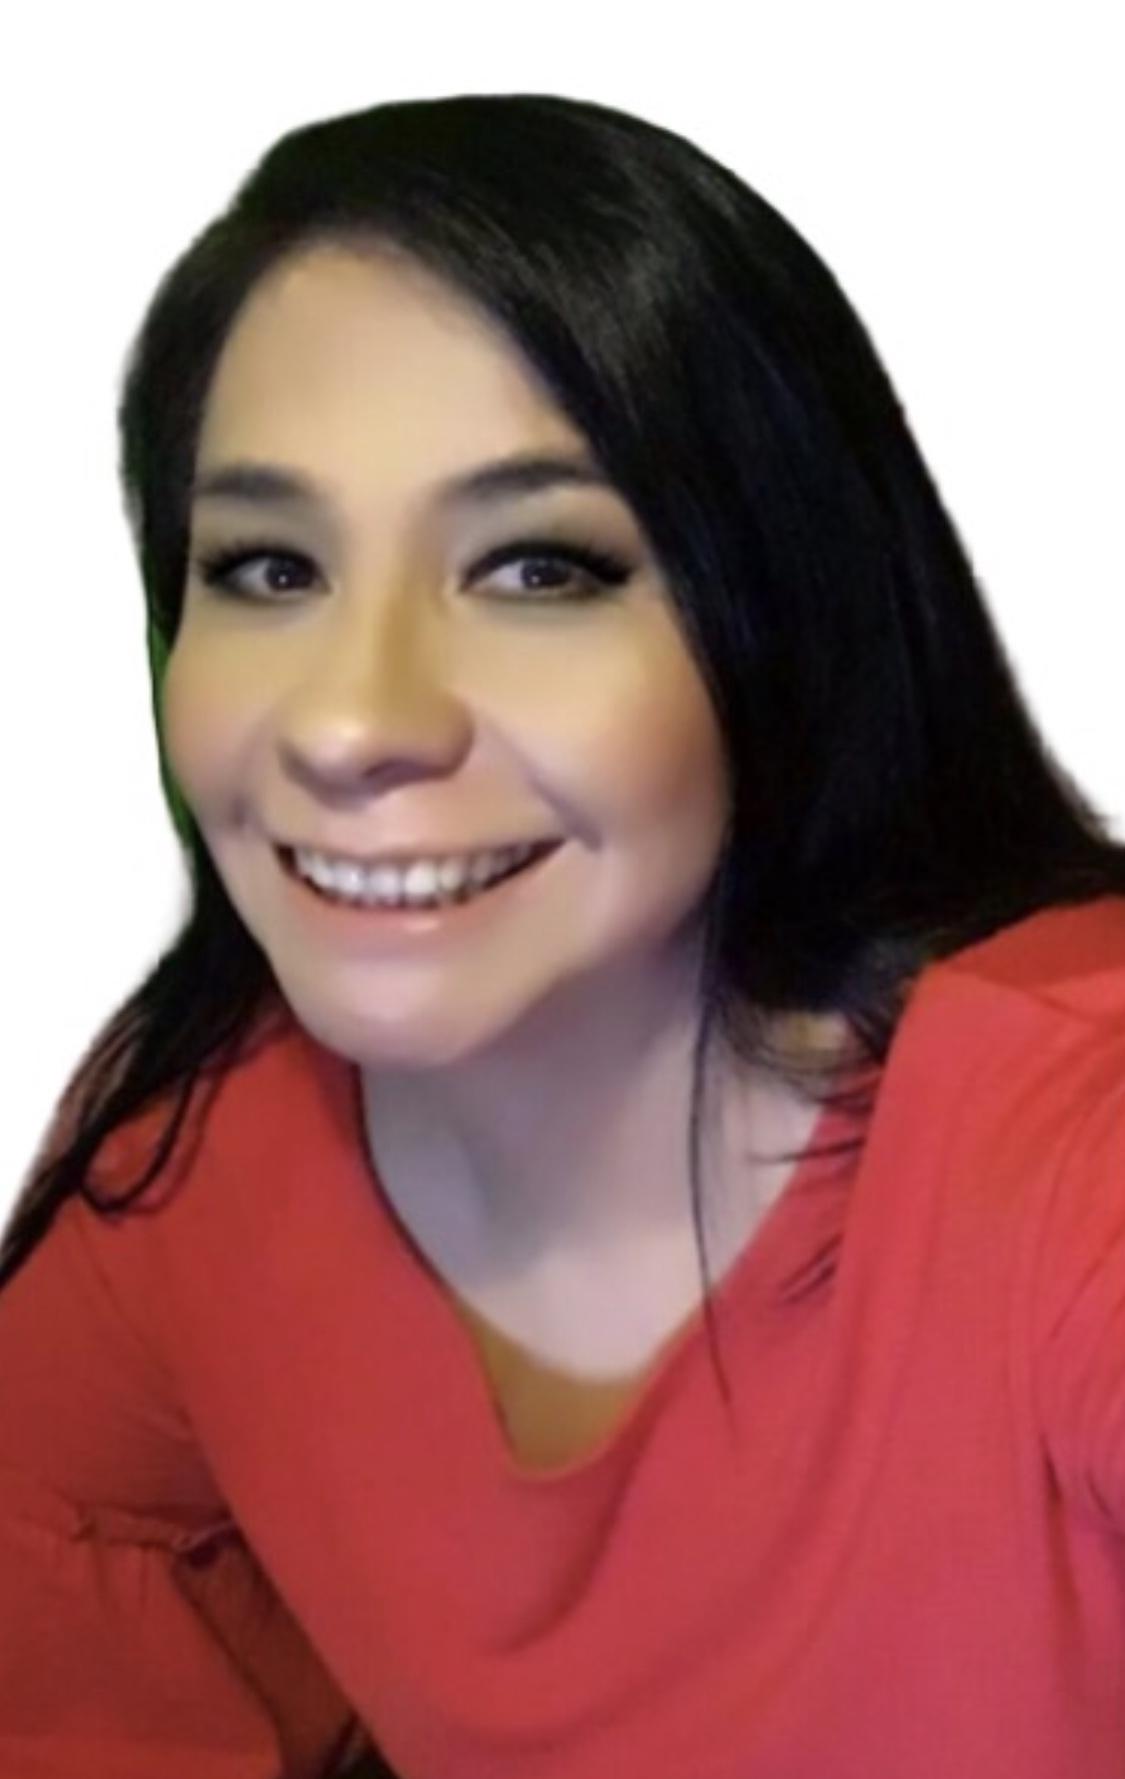 Brenda Peña